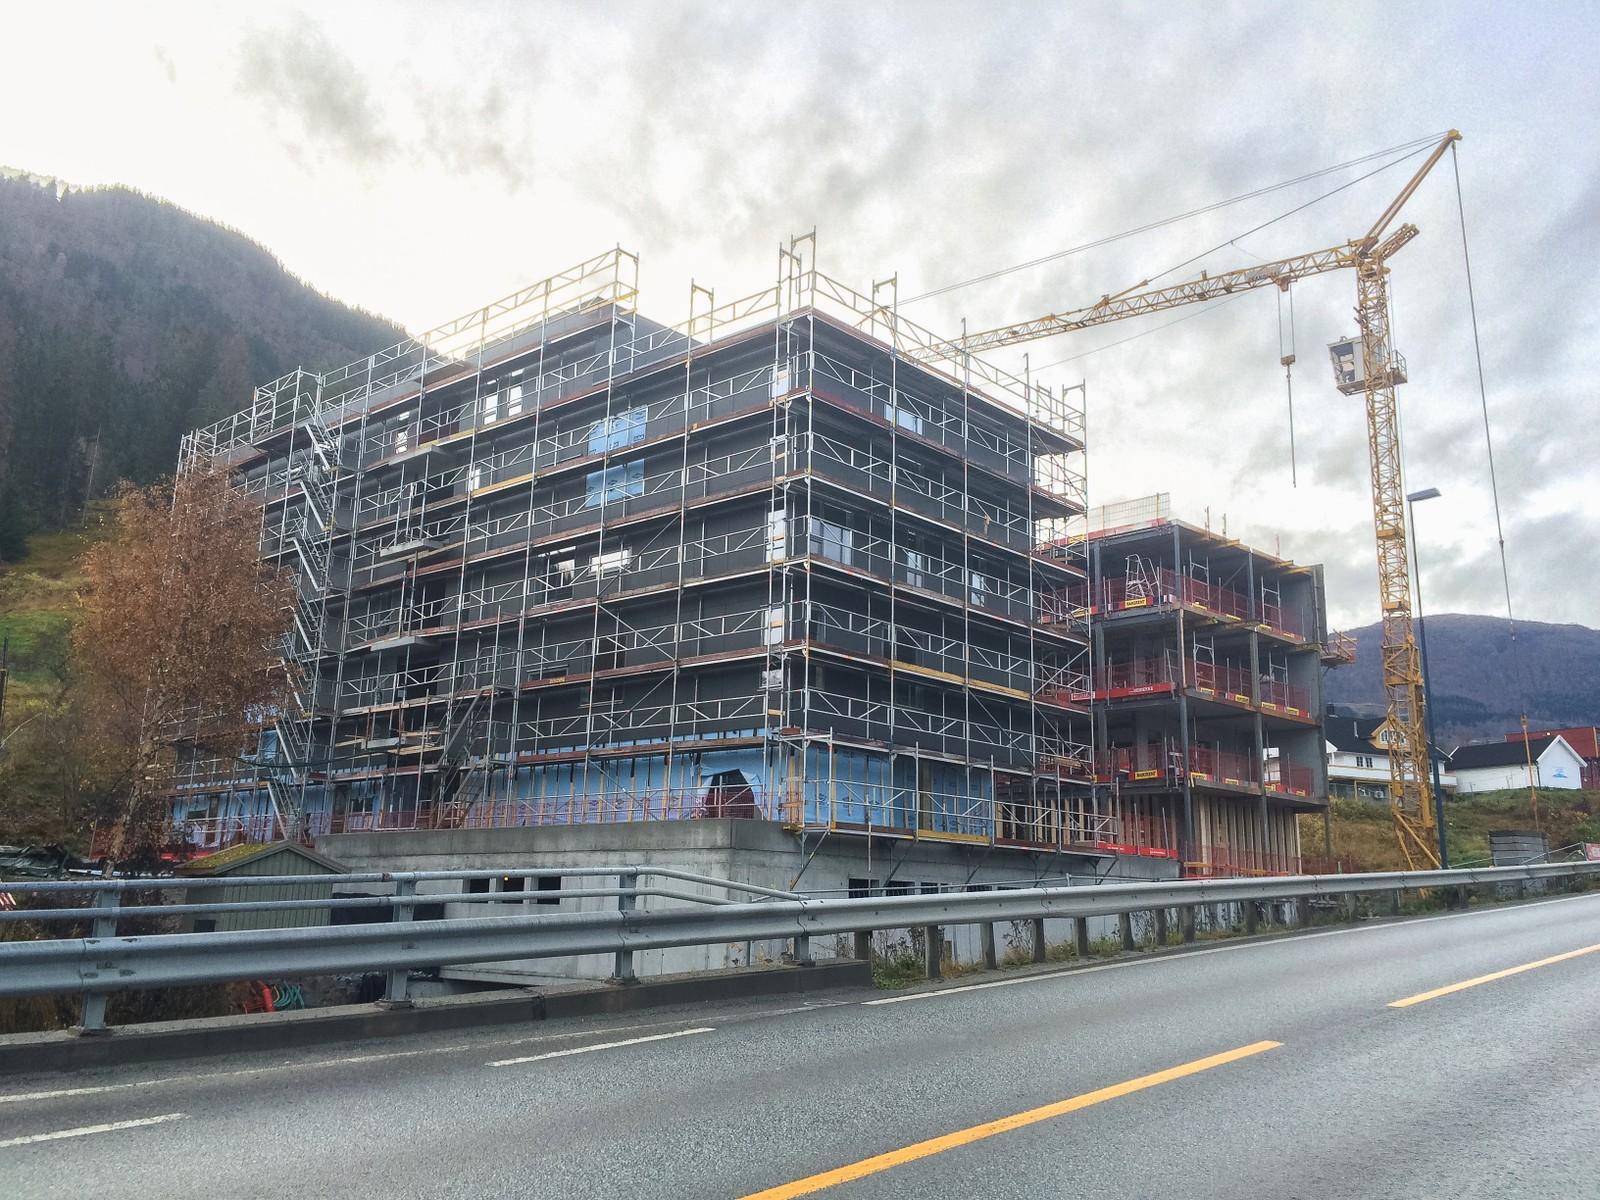 STUDENTBUSTADER: 150 studentbustader i Nedrehagen er under bygging og skal stå klare i 2016. Kostar 127 millionar.